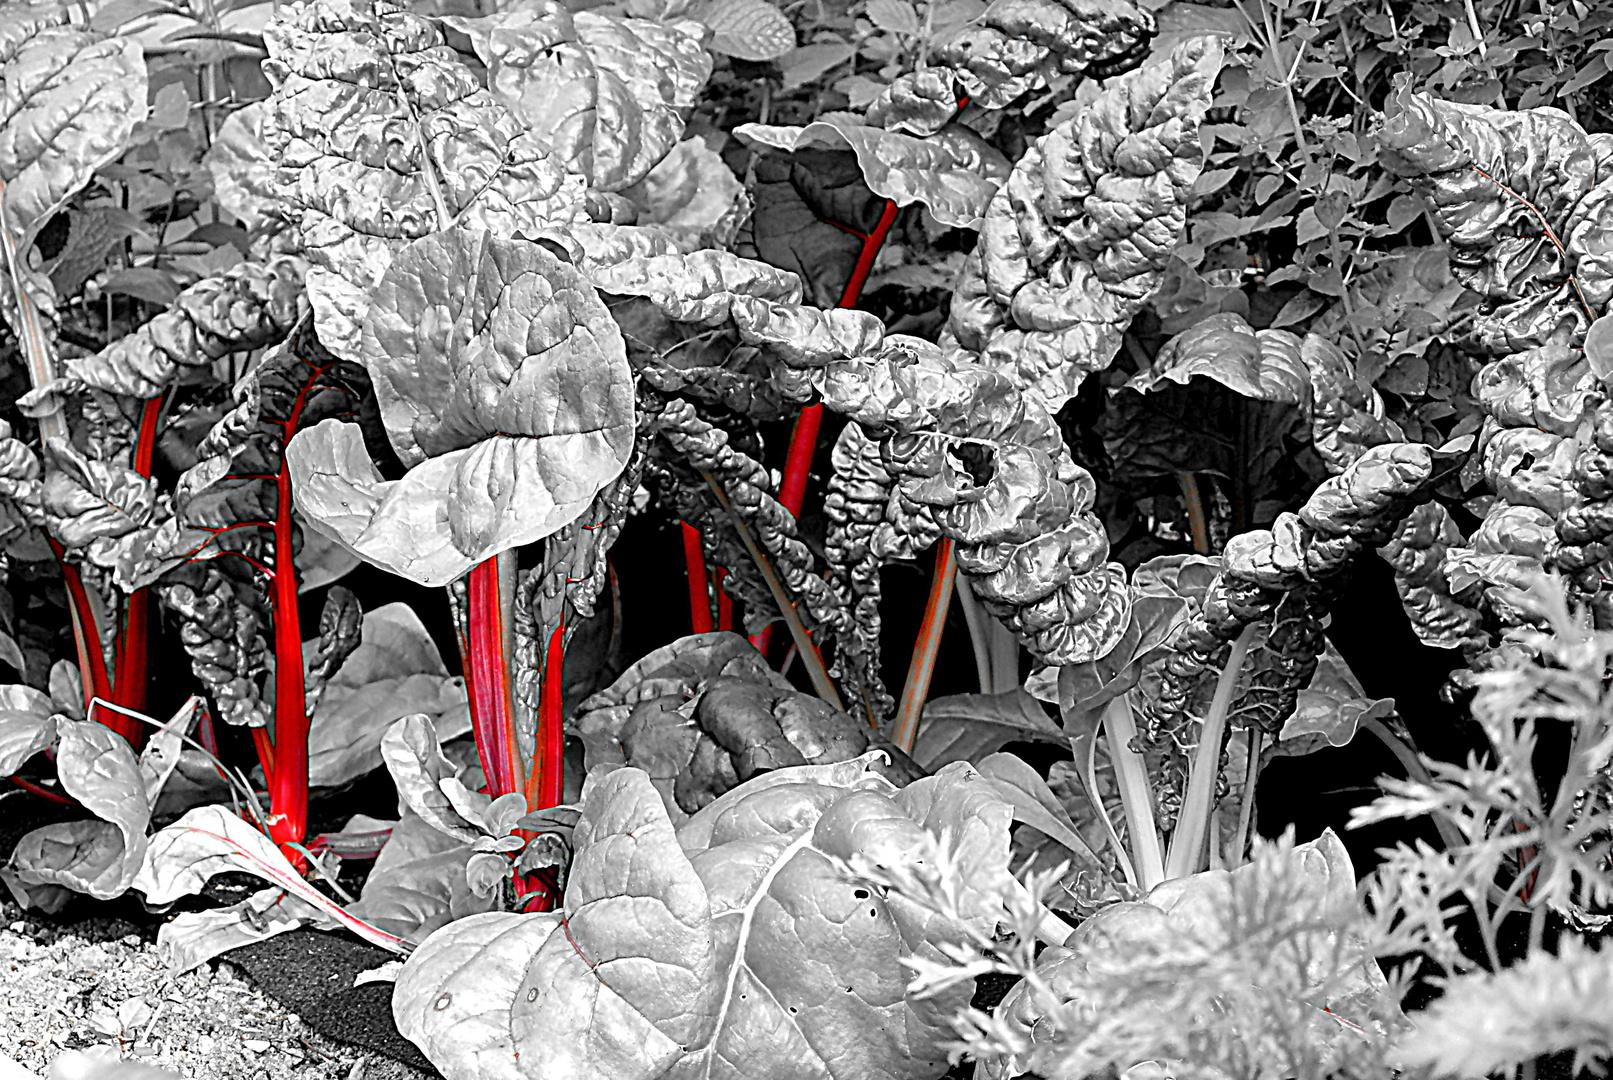 quer beet foto bild pflanzen pilze flechten natur bilder auf fotocommunity. Black Bedroom Furniture Sets. Home Design Ideas